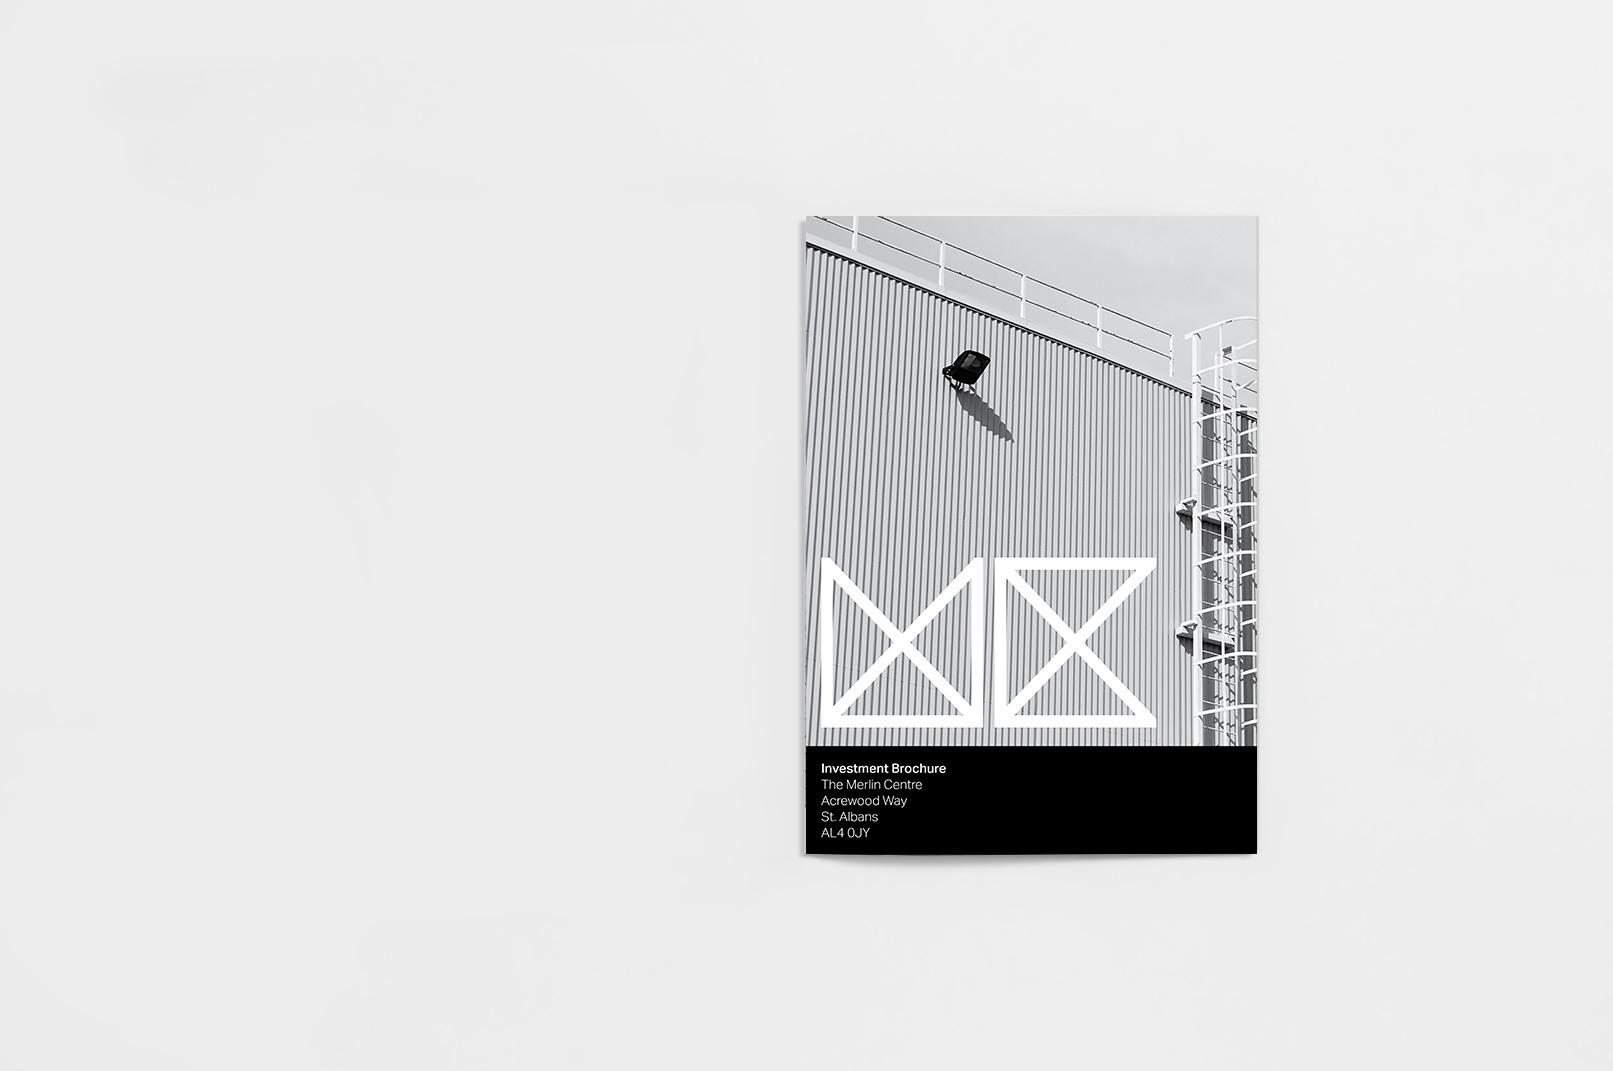 Merlin-Centre-Brochure-by-ALSO_Agency-02.jpg